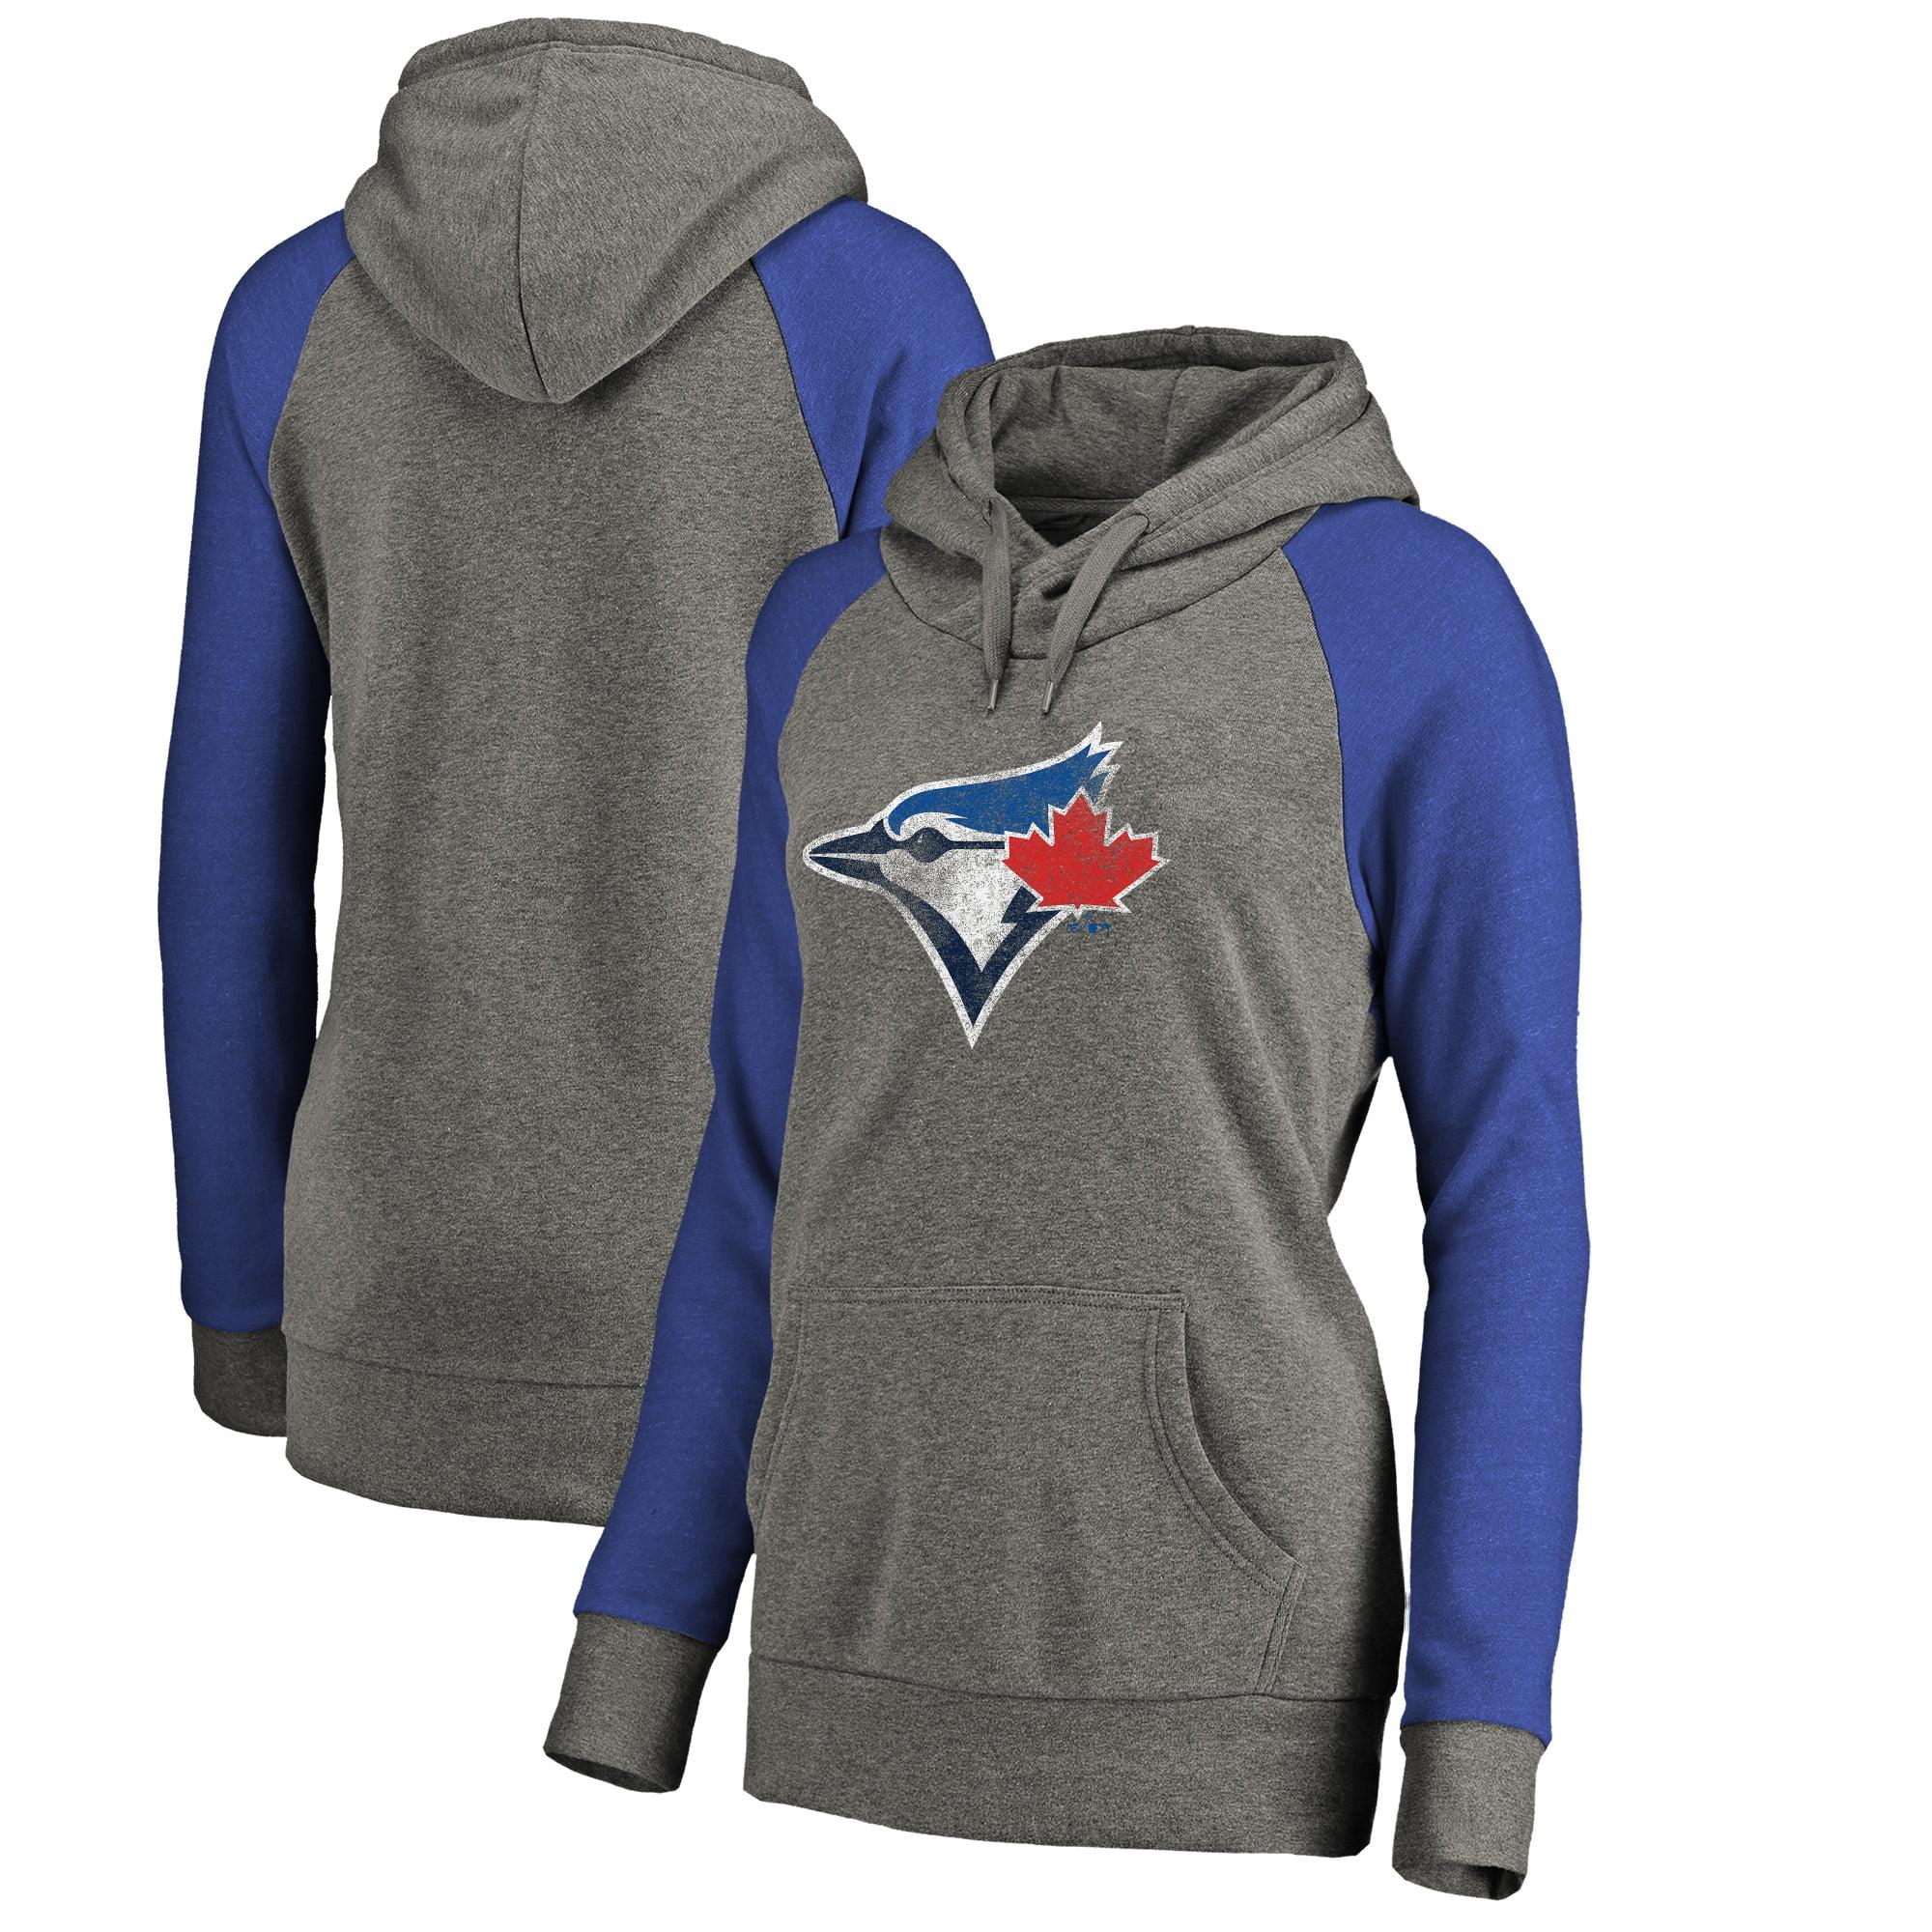 Toronto Blue Jays Fanatics Branded Women's Distressed Team Logo Tri-Blend Plus Size Raglan Pullover Hoodie - Gray/Royal